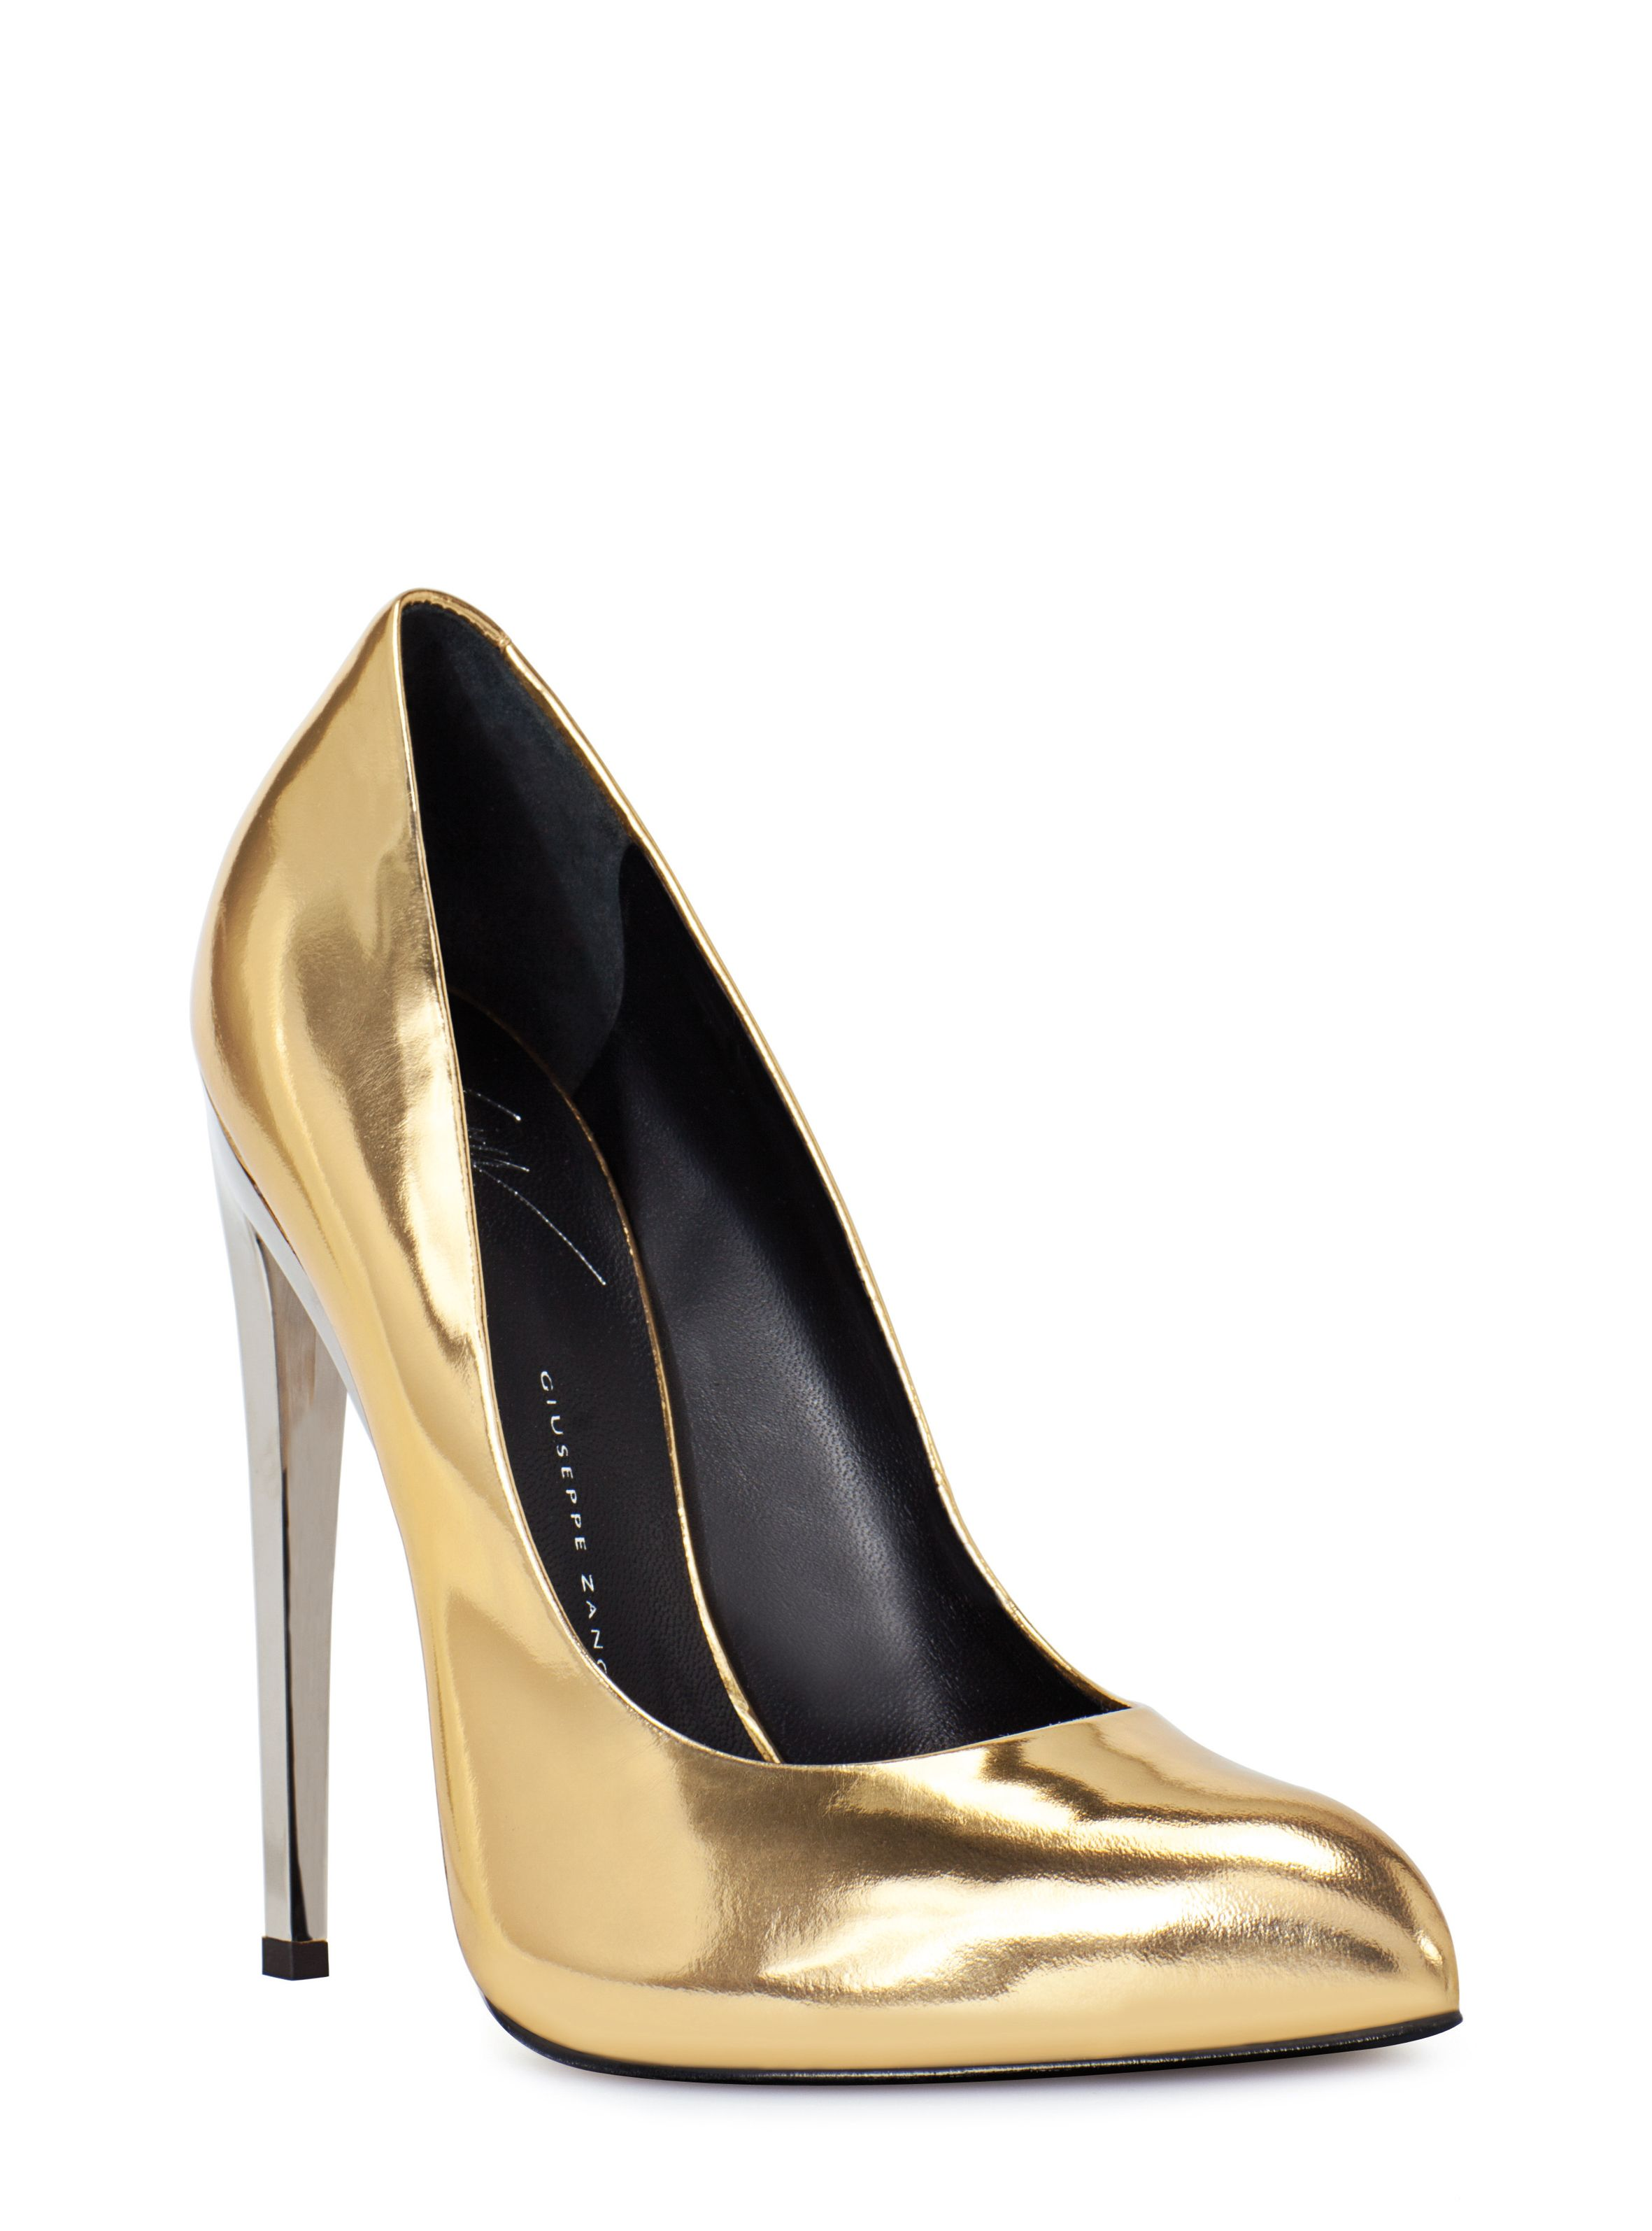 A Effect Inside Patent In Leather Taconeszapatillasmi Mirror With Platform Small Court Shoes Vanguardistastacones Estilozapatos Gold waIZZv